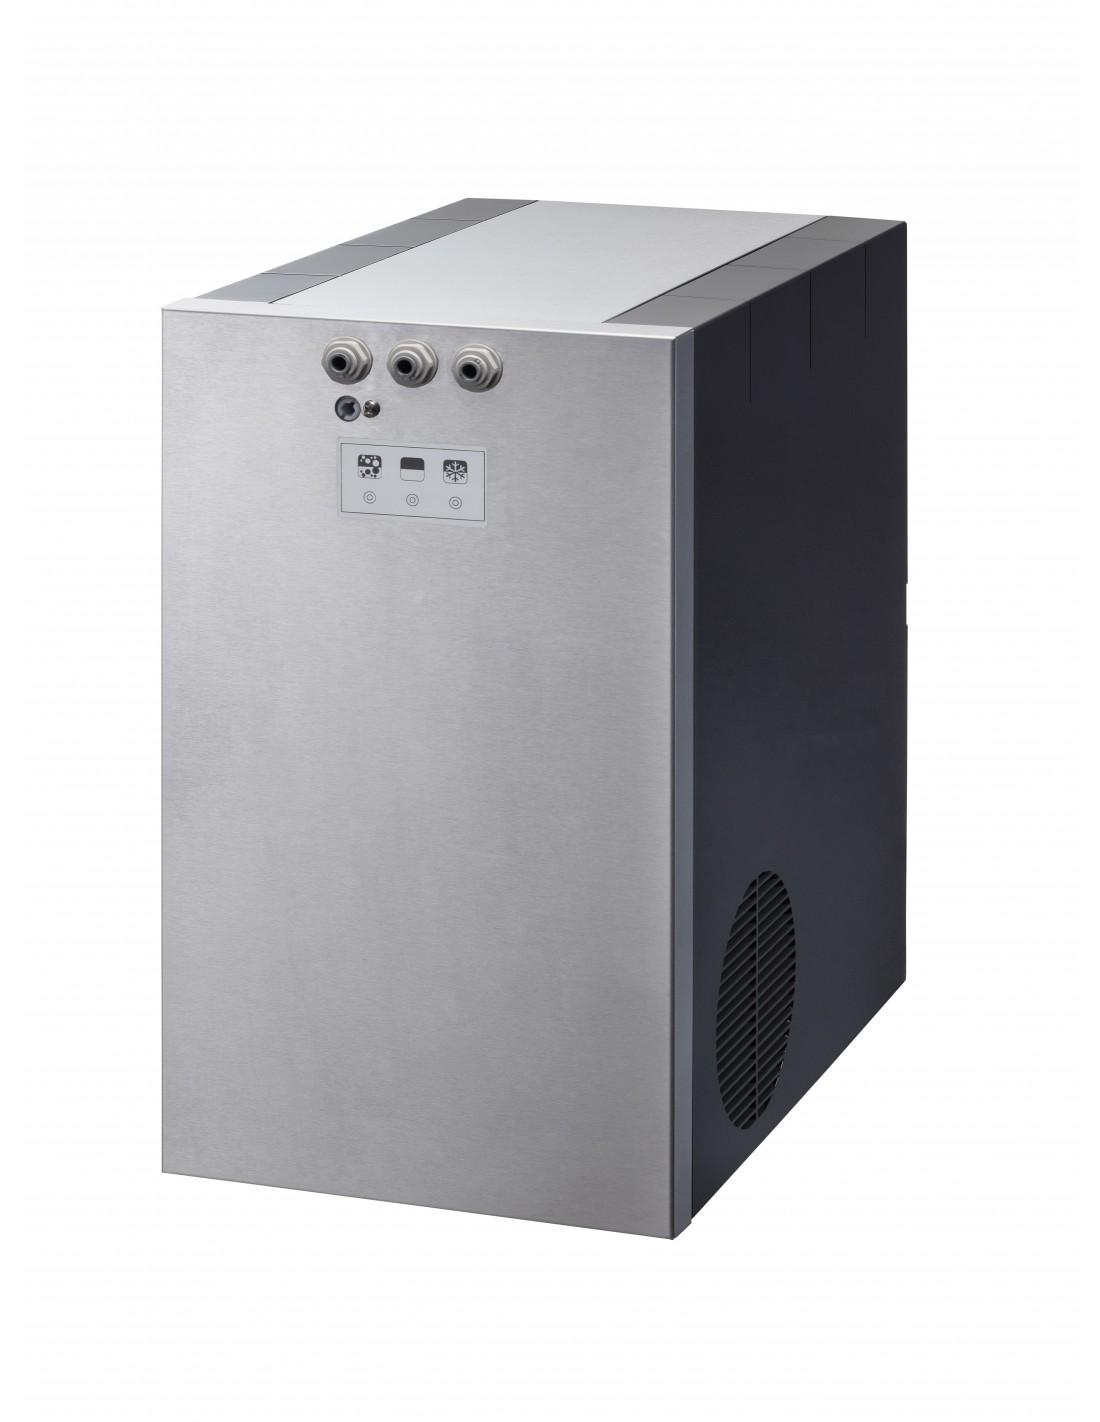 UPP00173 - Kolsyrat vatten - Blupura Piccola Box 15